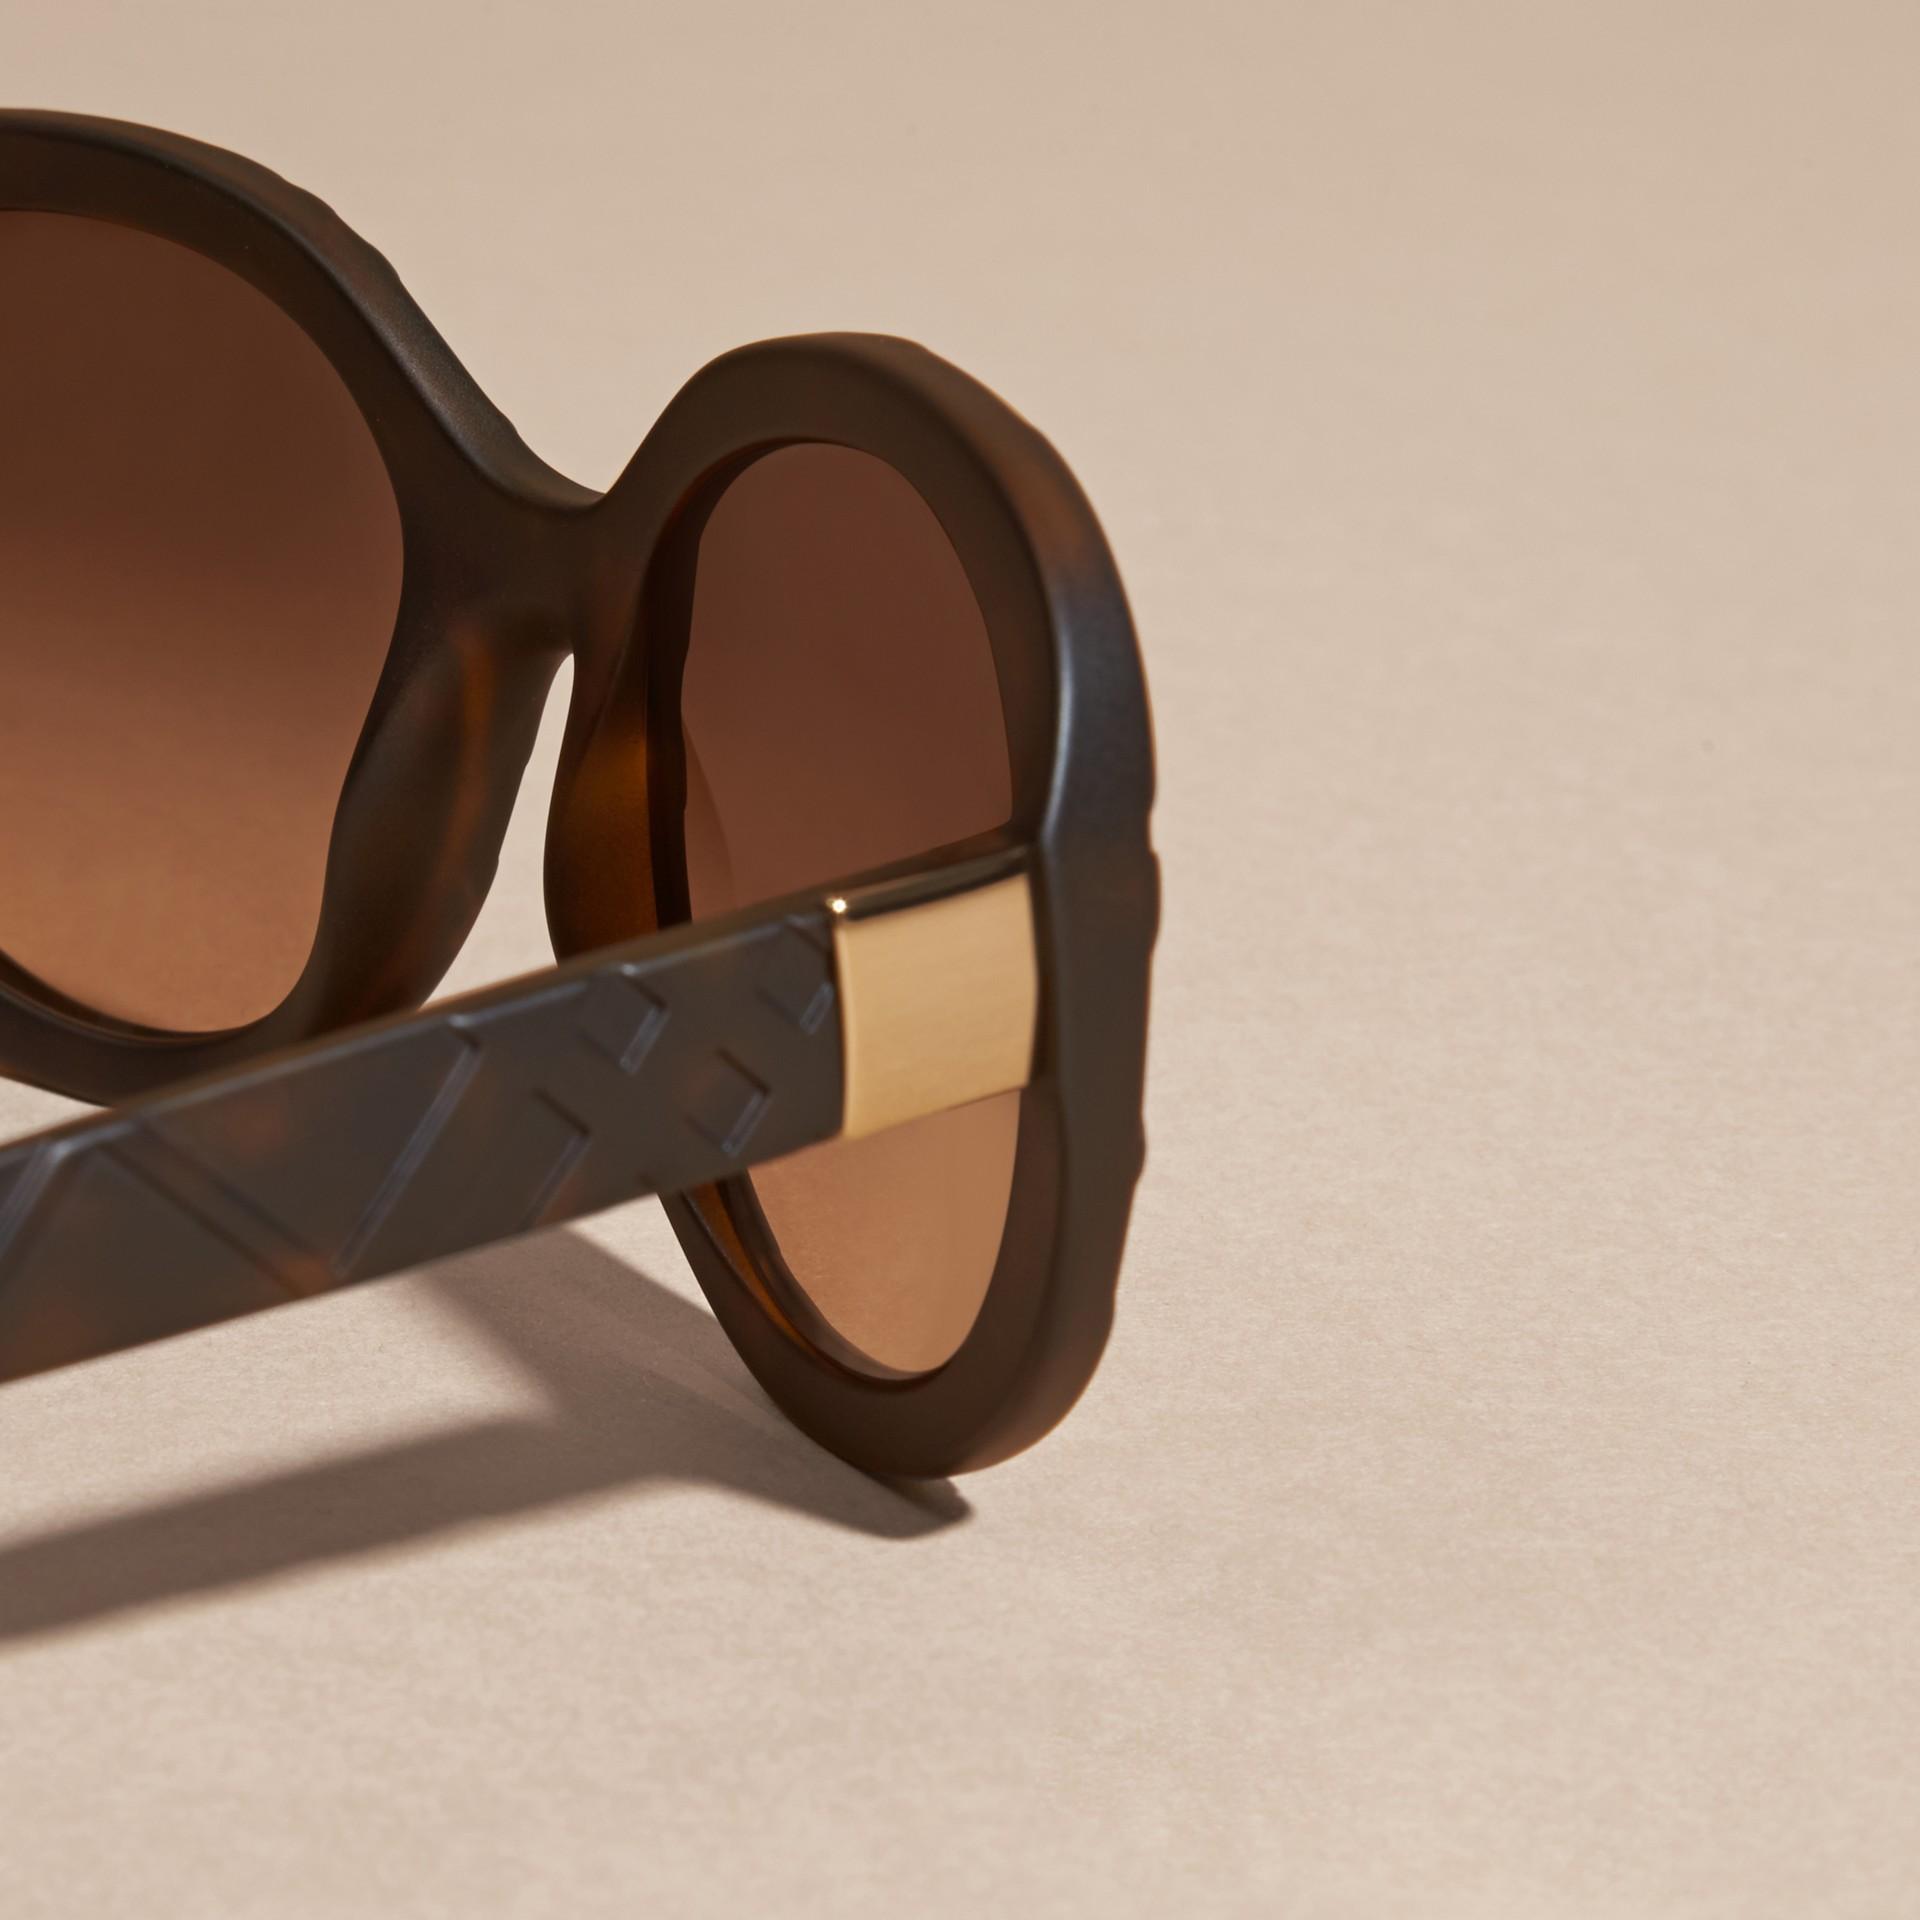 Tortoise shell 3D Check Round Frame Sunglasses Tortoise Shell - gallery image 2